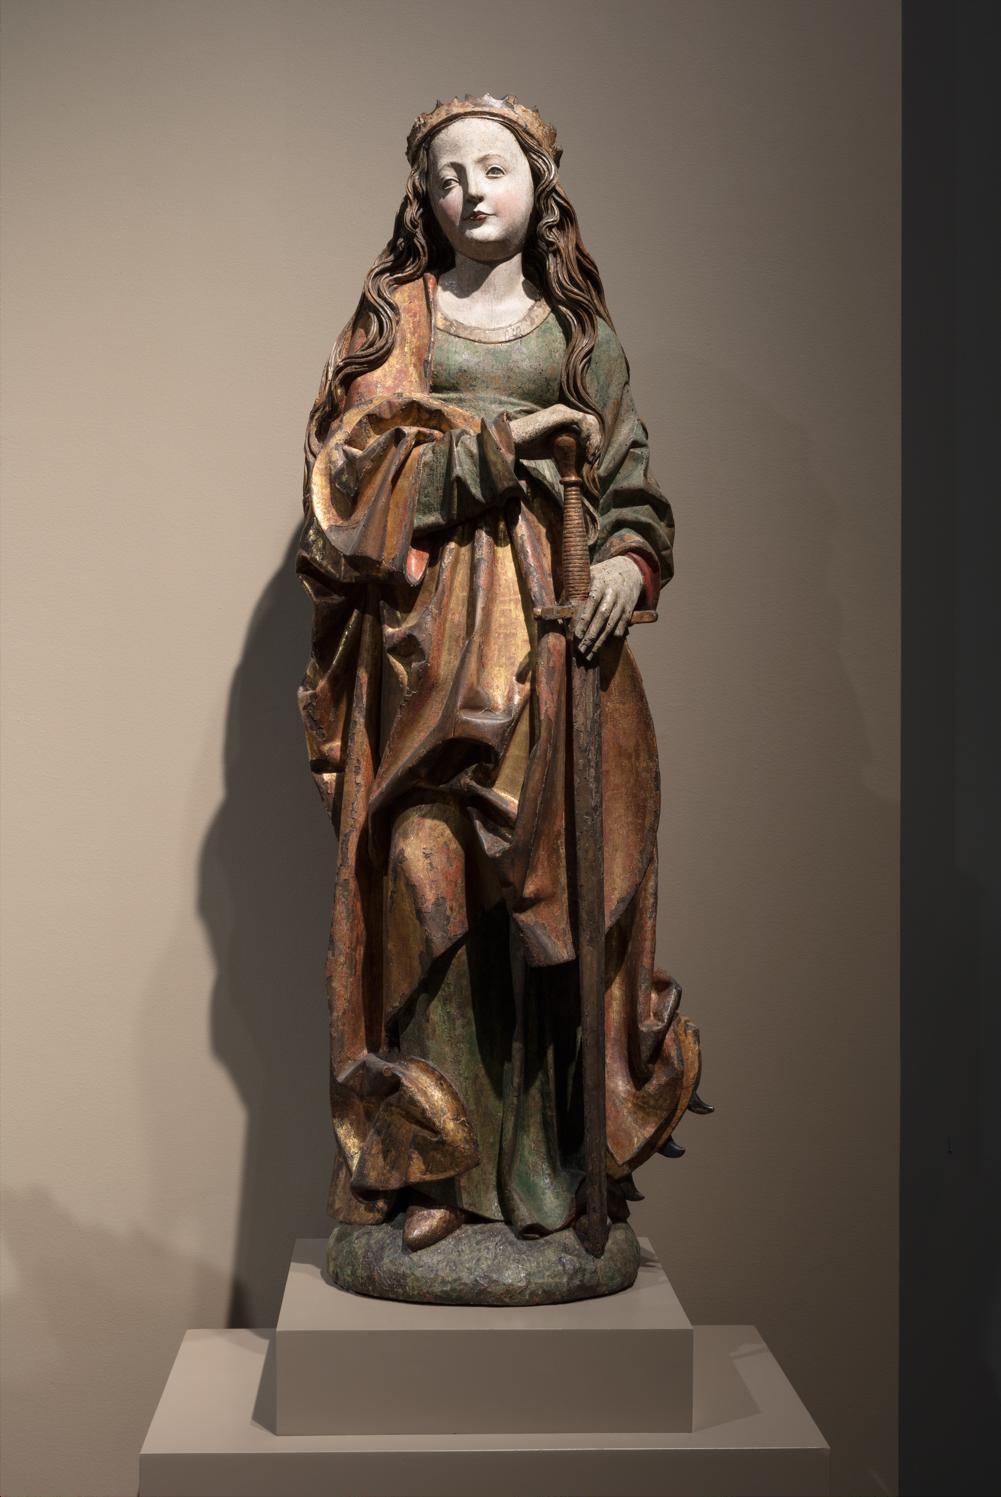 St Catherine sculpture at 2850K + 2700K, 0% vibrancy